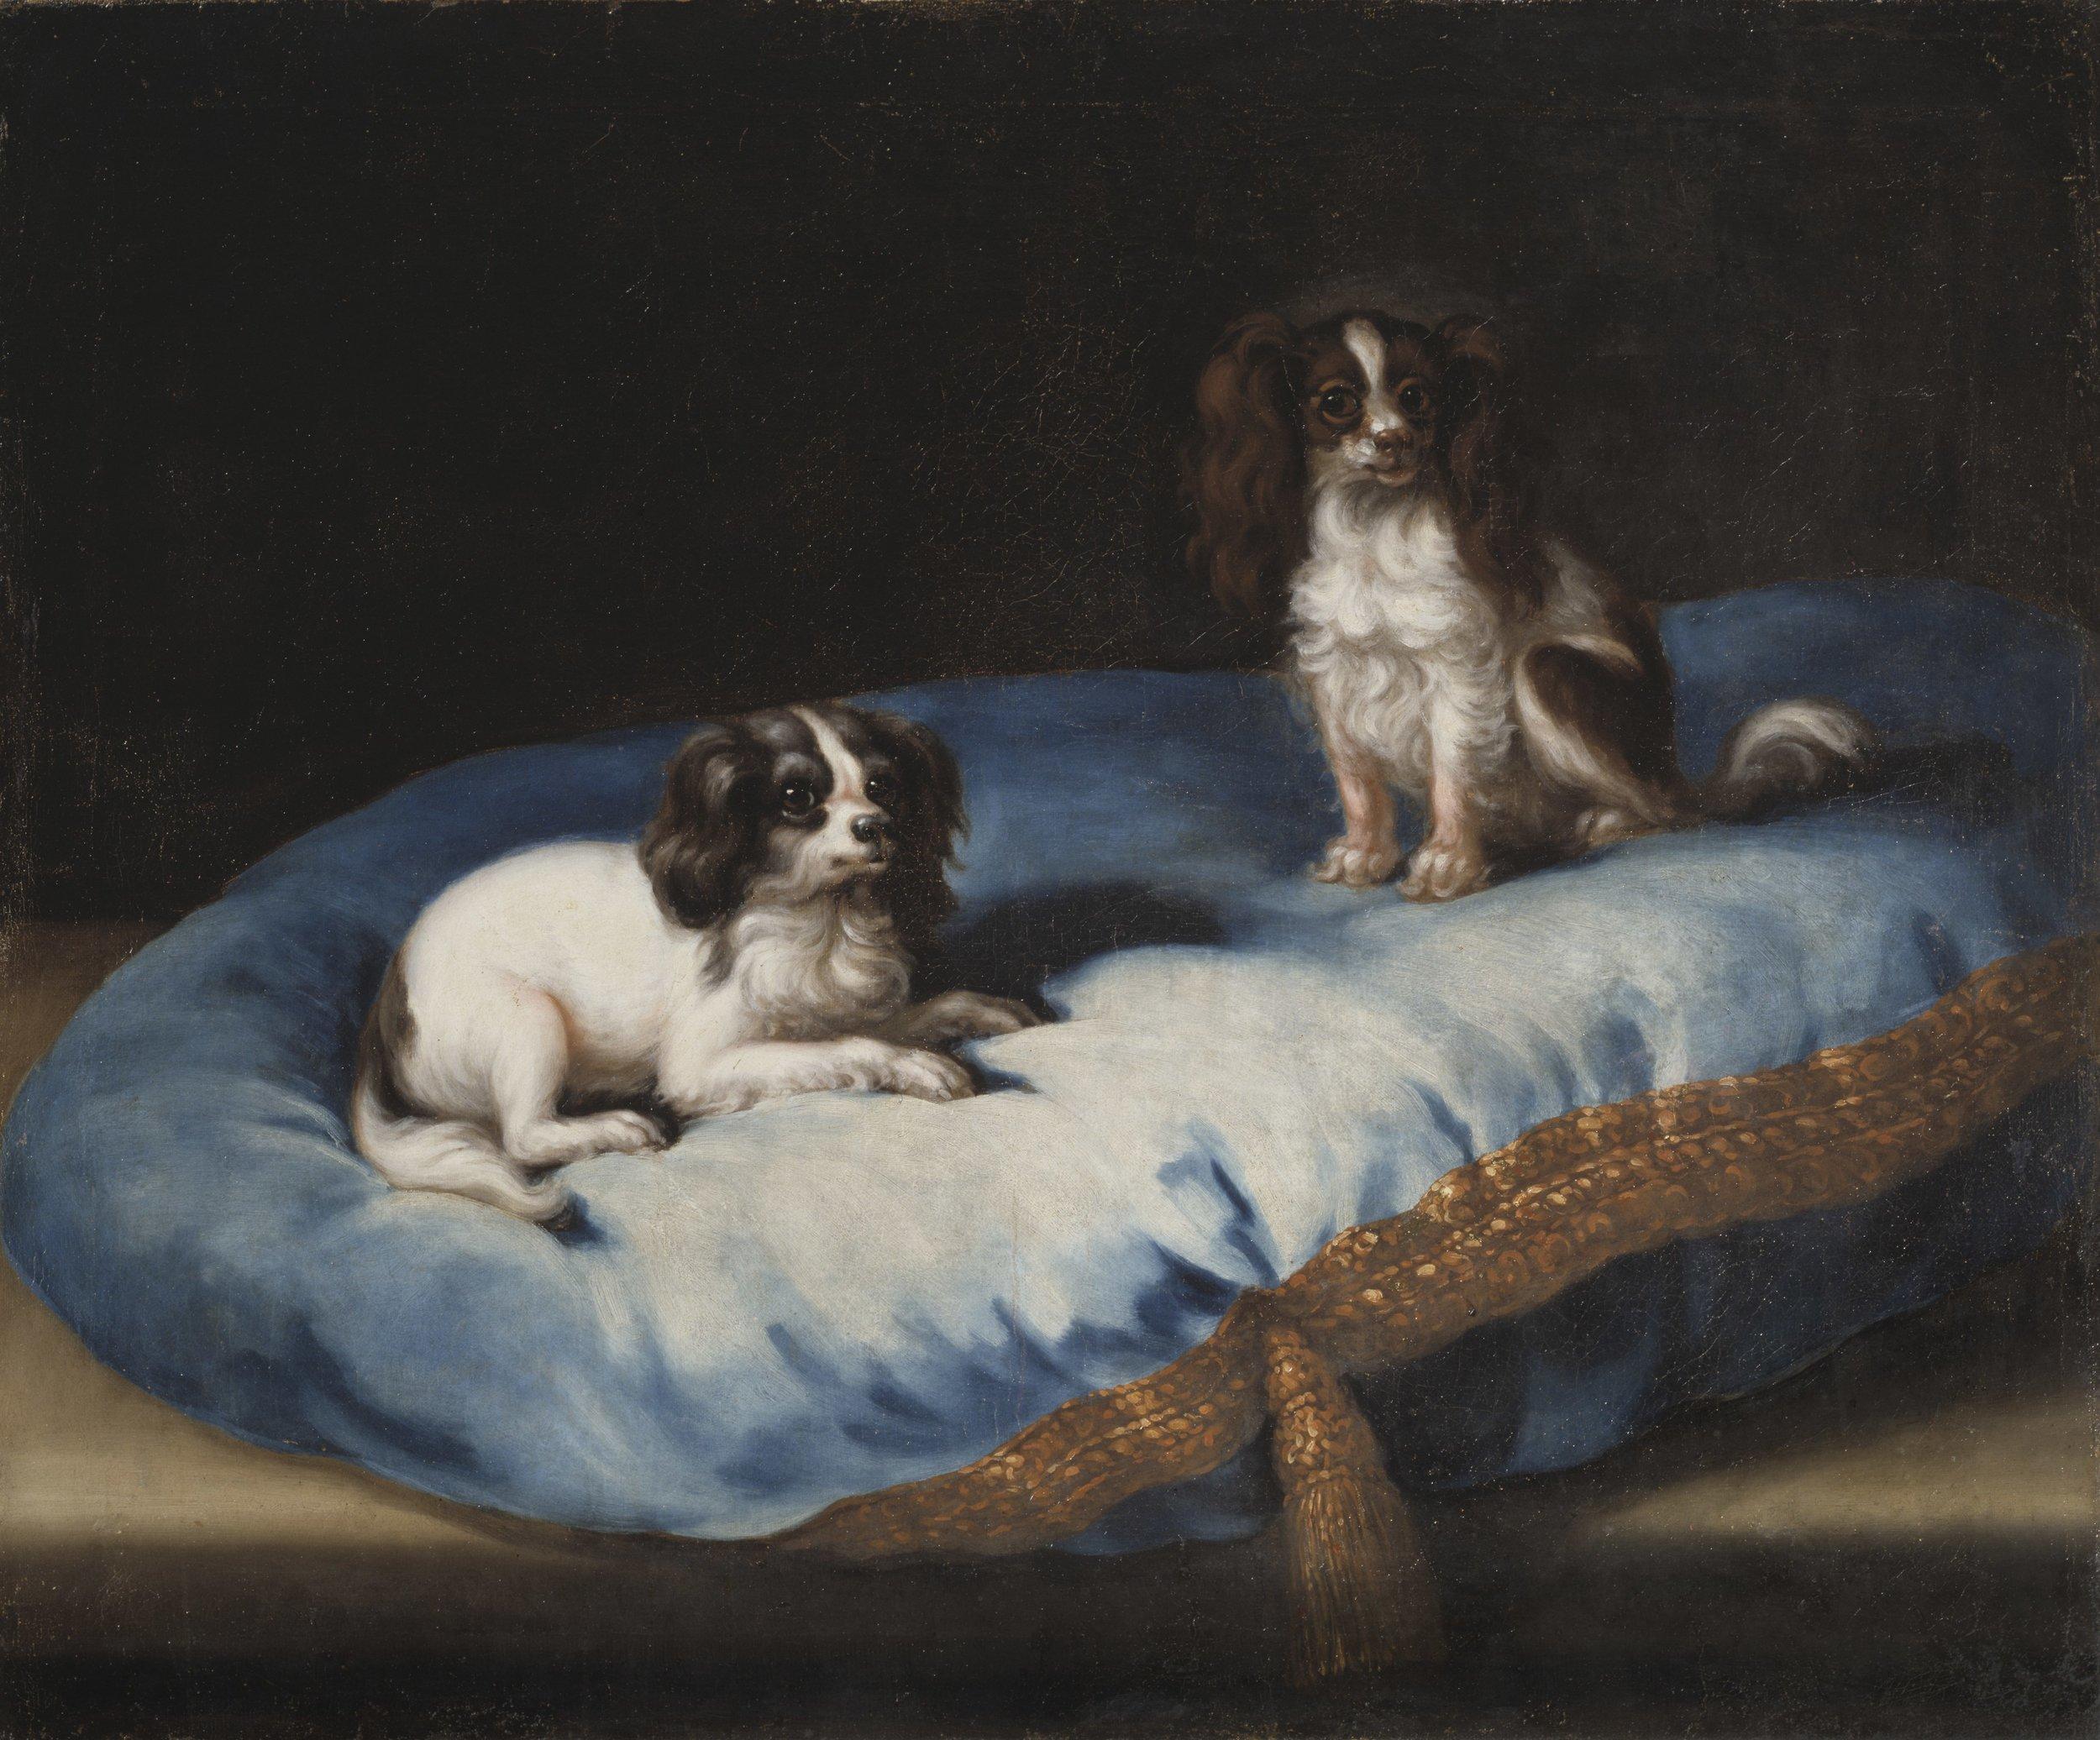 David Klöcker Ehrenstrahl, Två mindre hundar, Nationalmuseum, photographer Erik Cornelius.jpg